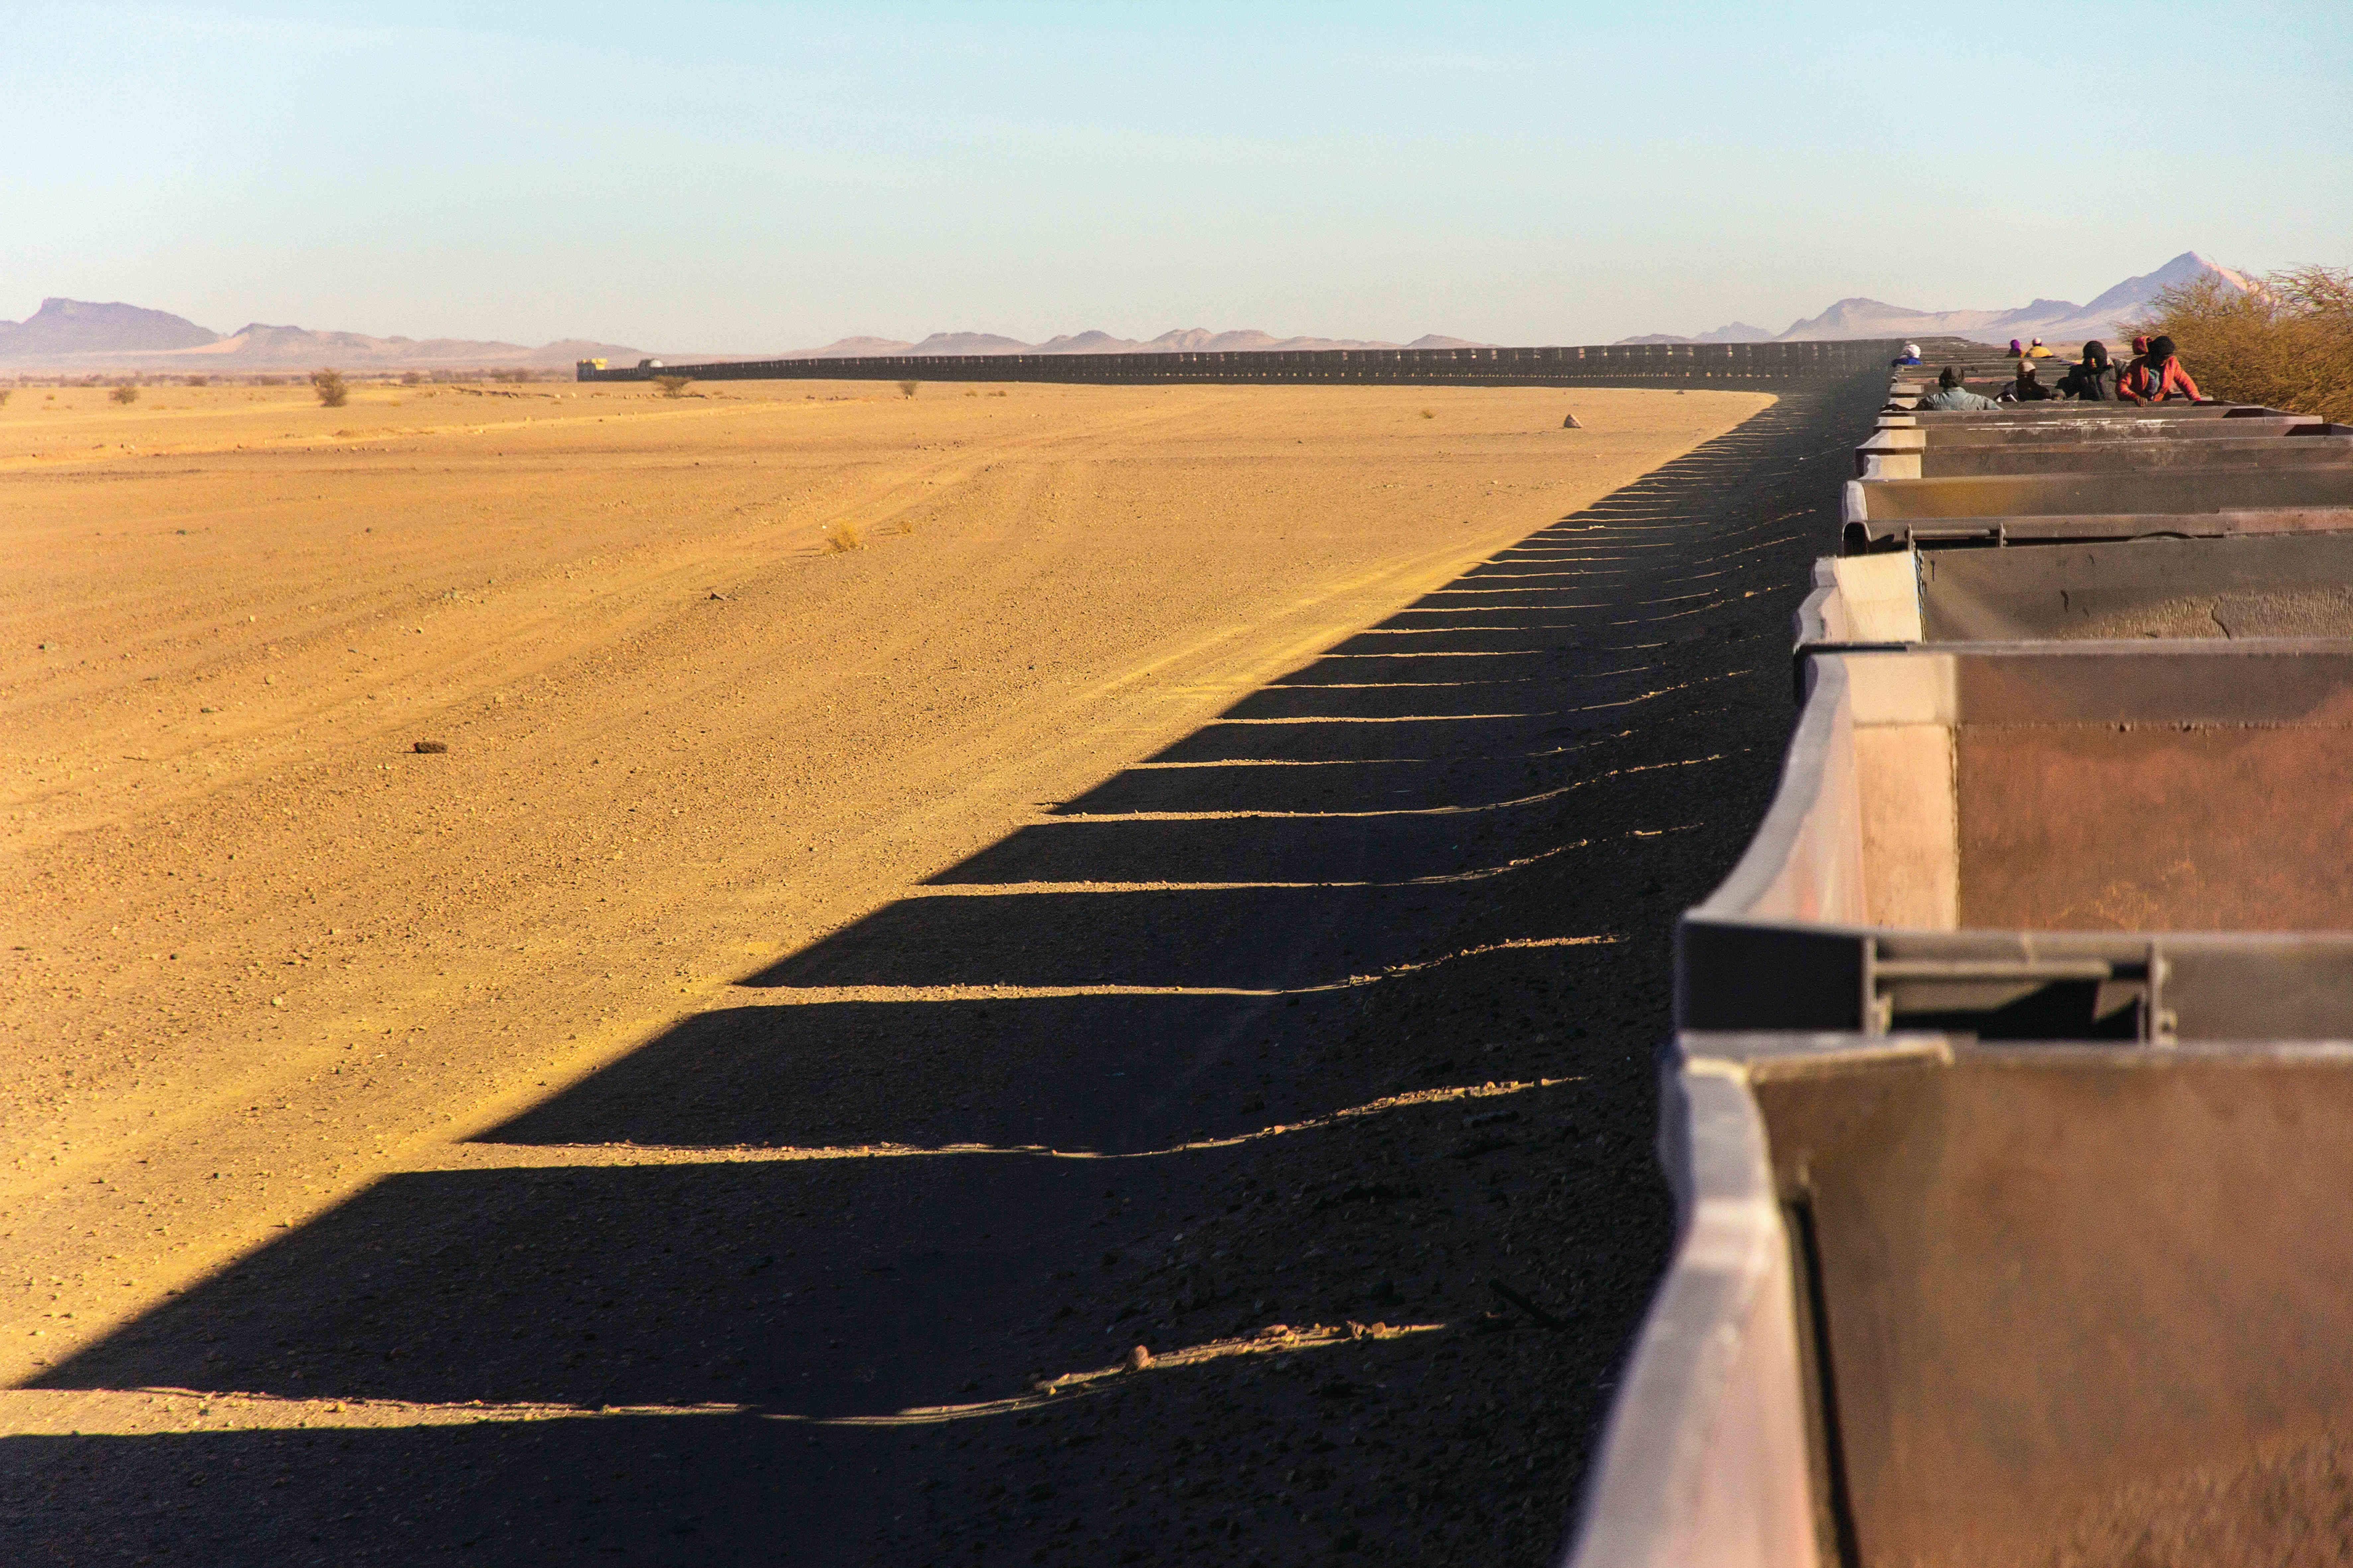 Photographer captures life on the legendary iron ore freight train of Mauritania